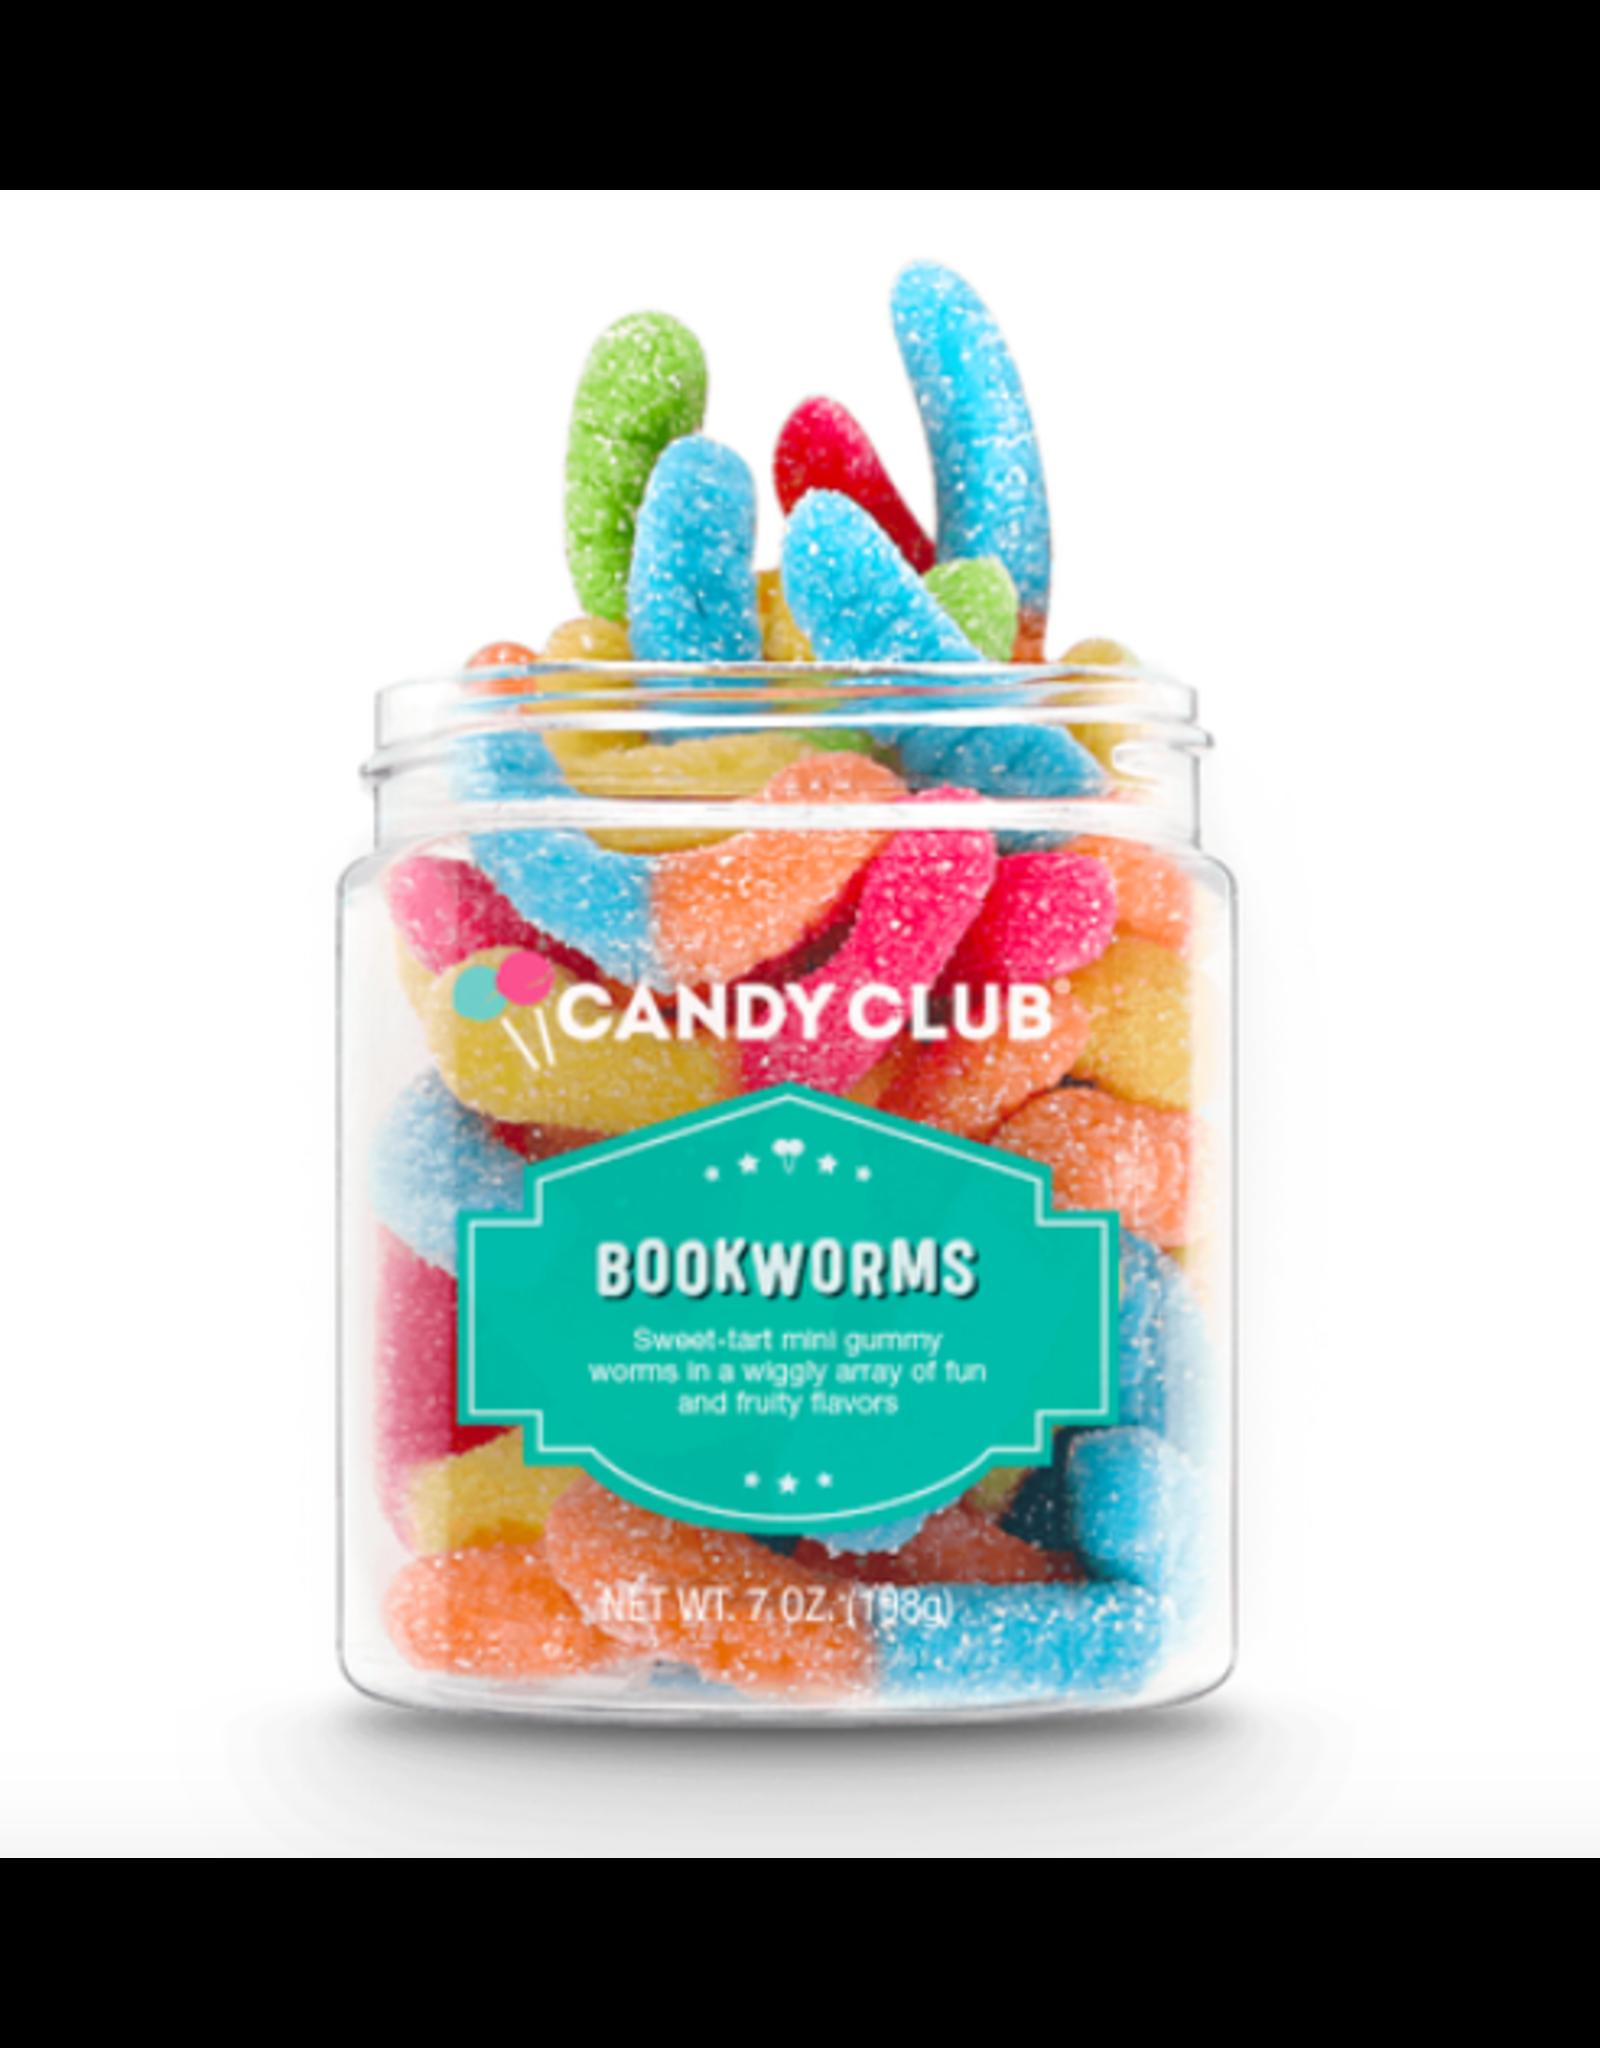 Candy Club BookWorms Candy Jar